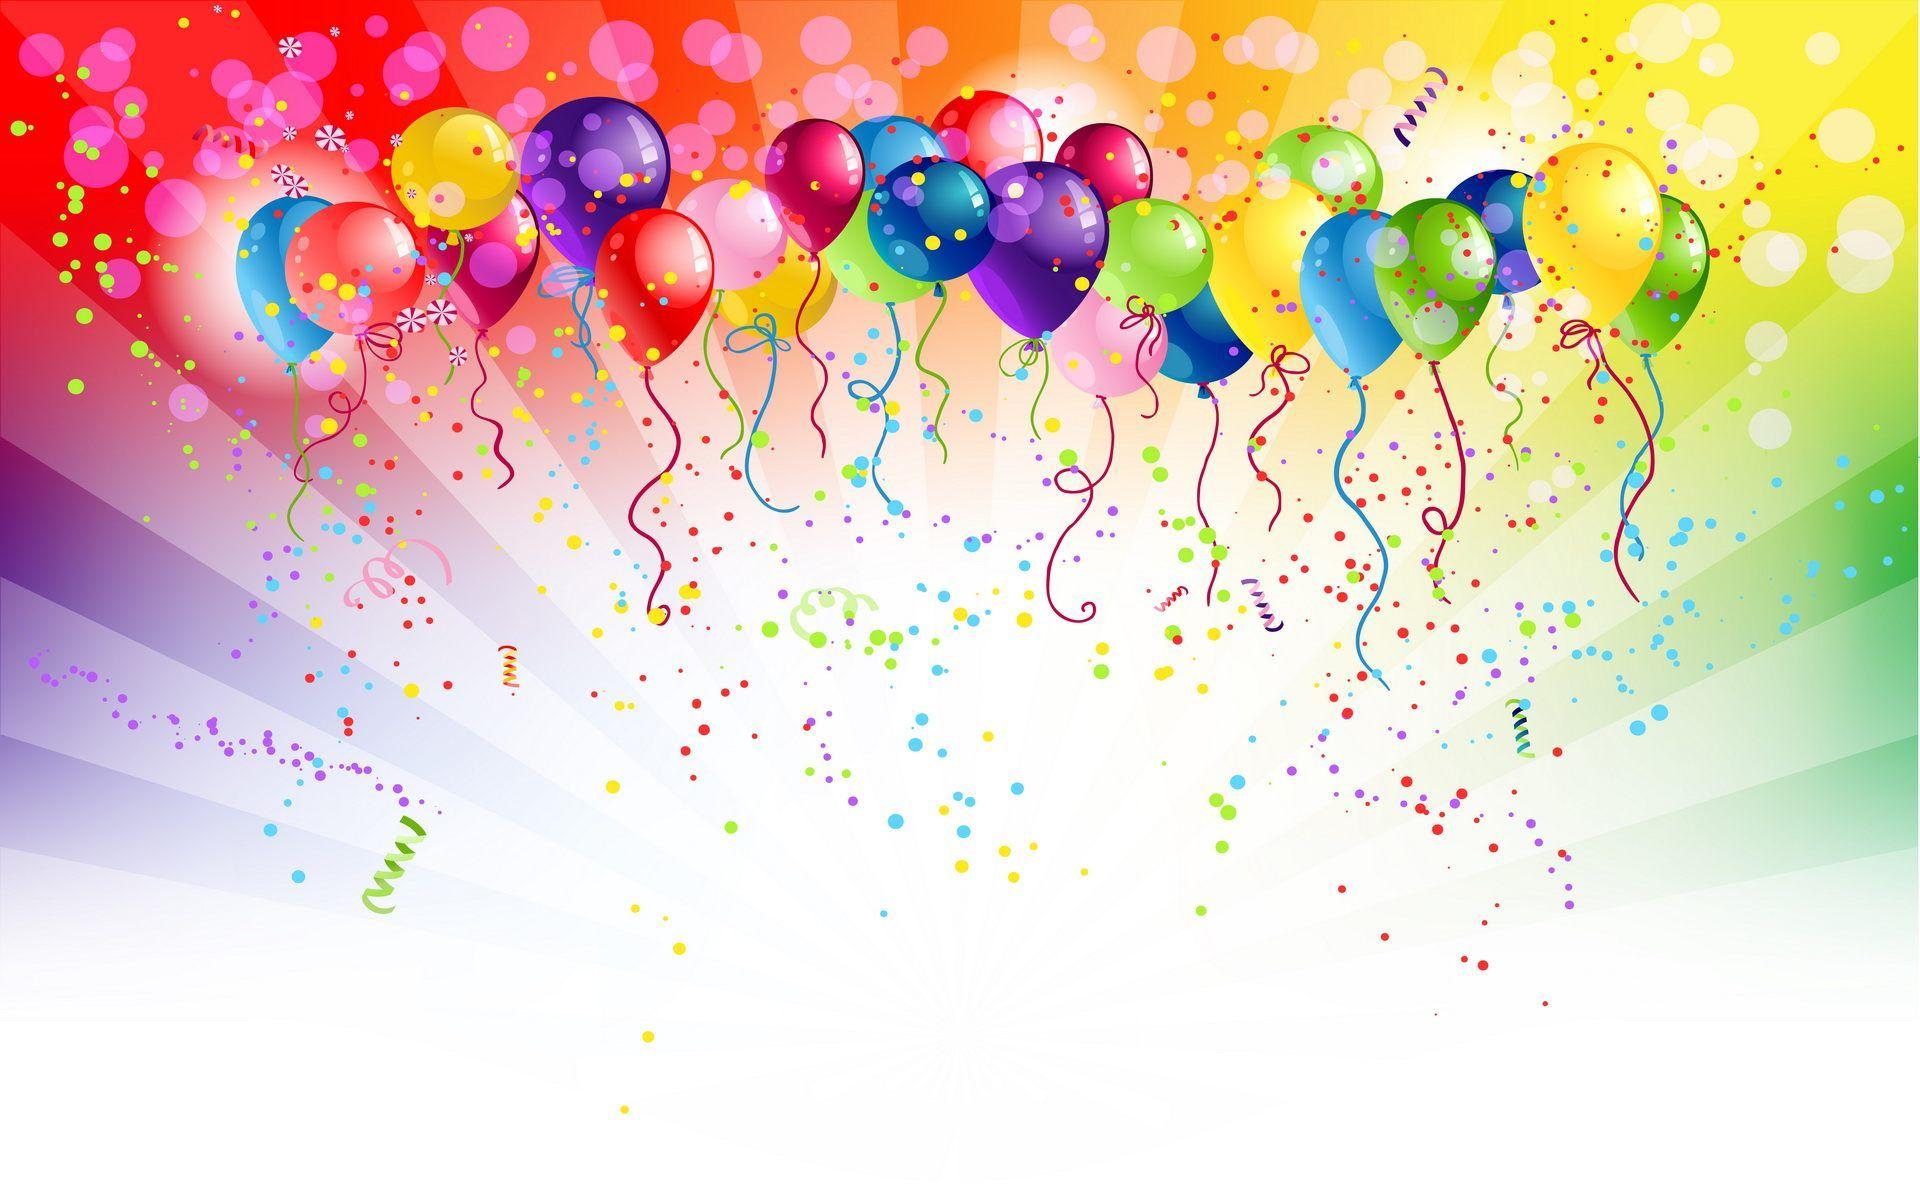 17 Best ideas about Birthday Wallpaper on Pinterest | Happy ...